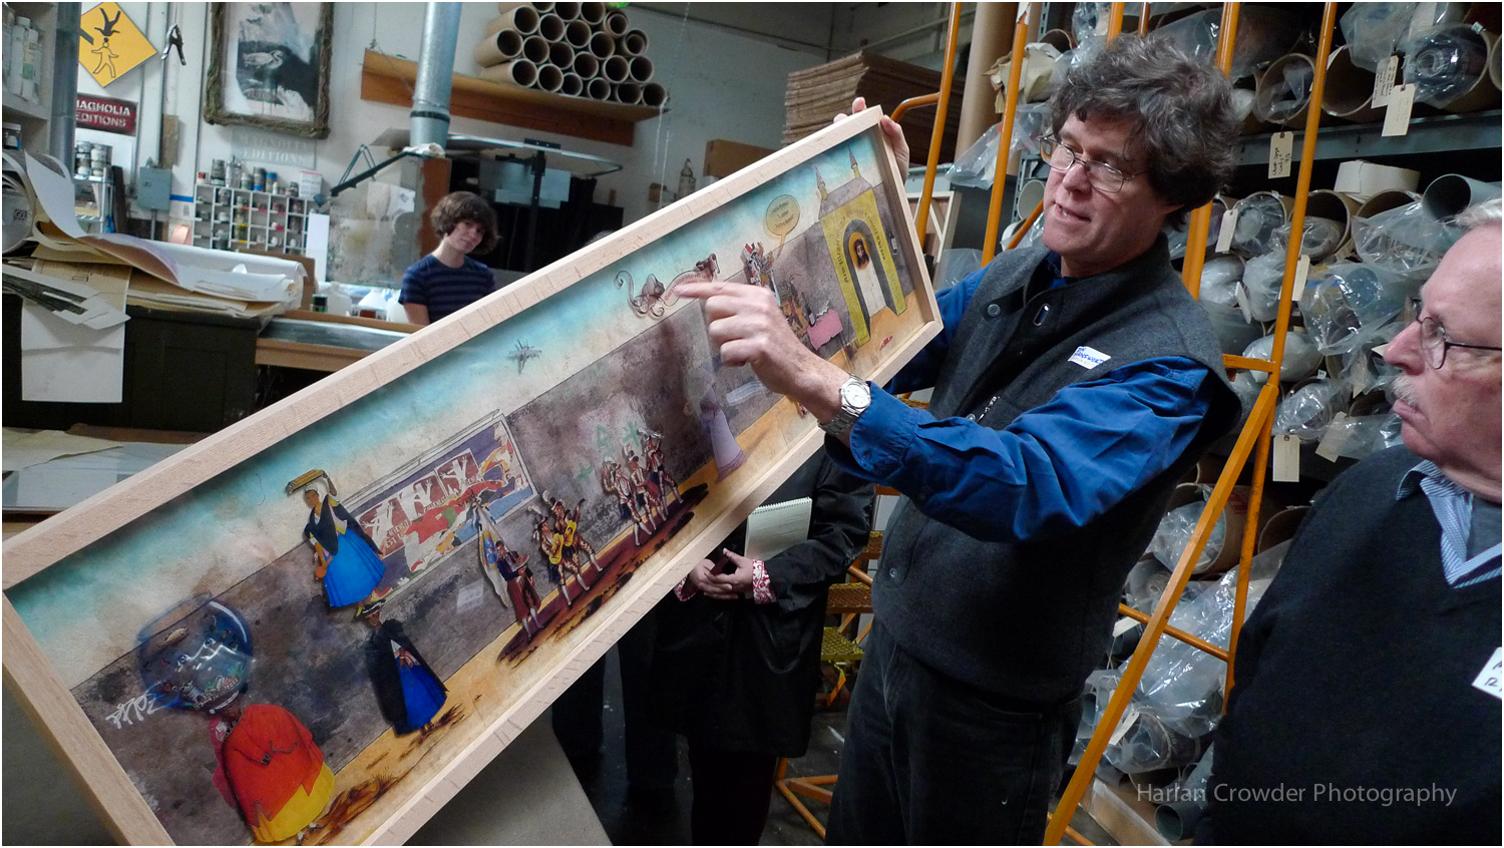 Donald Farnsworth, Printmaker, showing an artwork by Enrique Chagoya  ::  www.magnoliaeditions.com